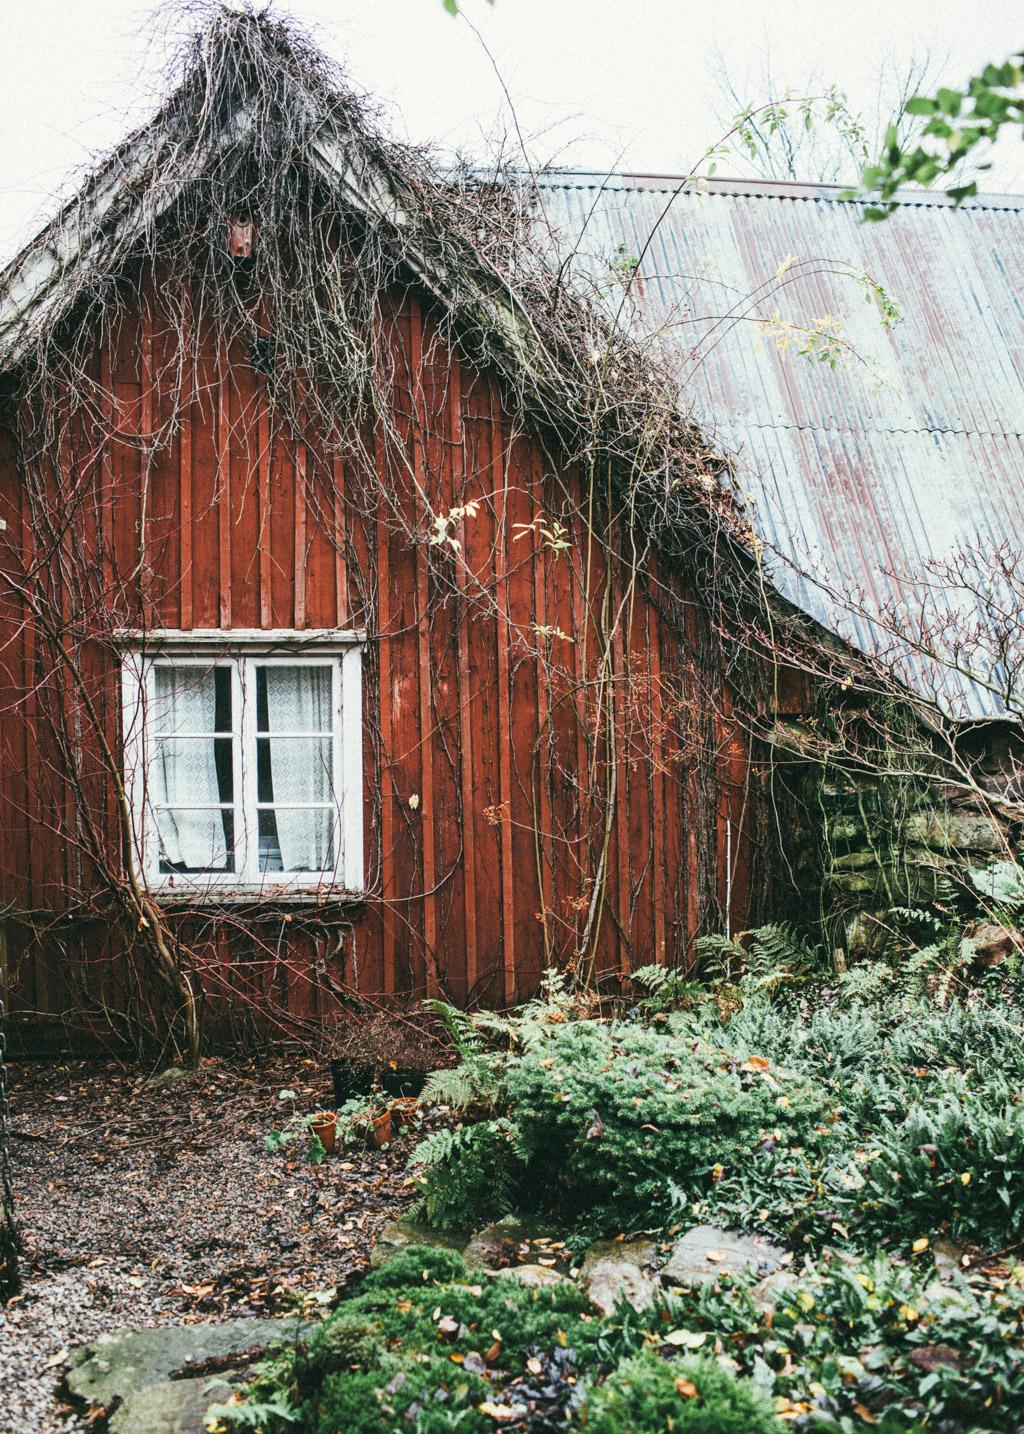 marie_lagerqvist-6814